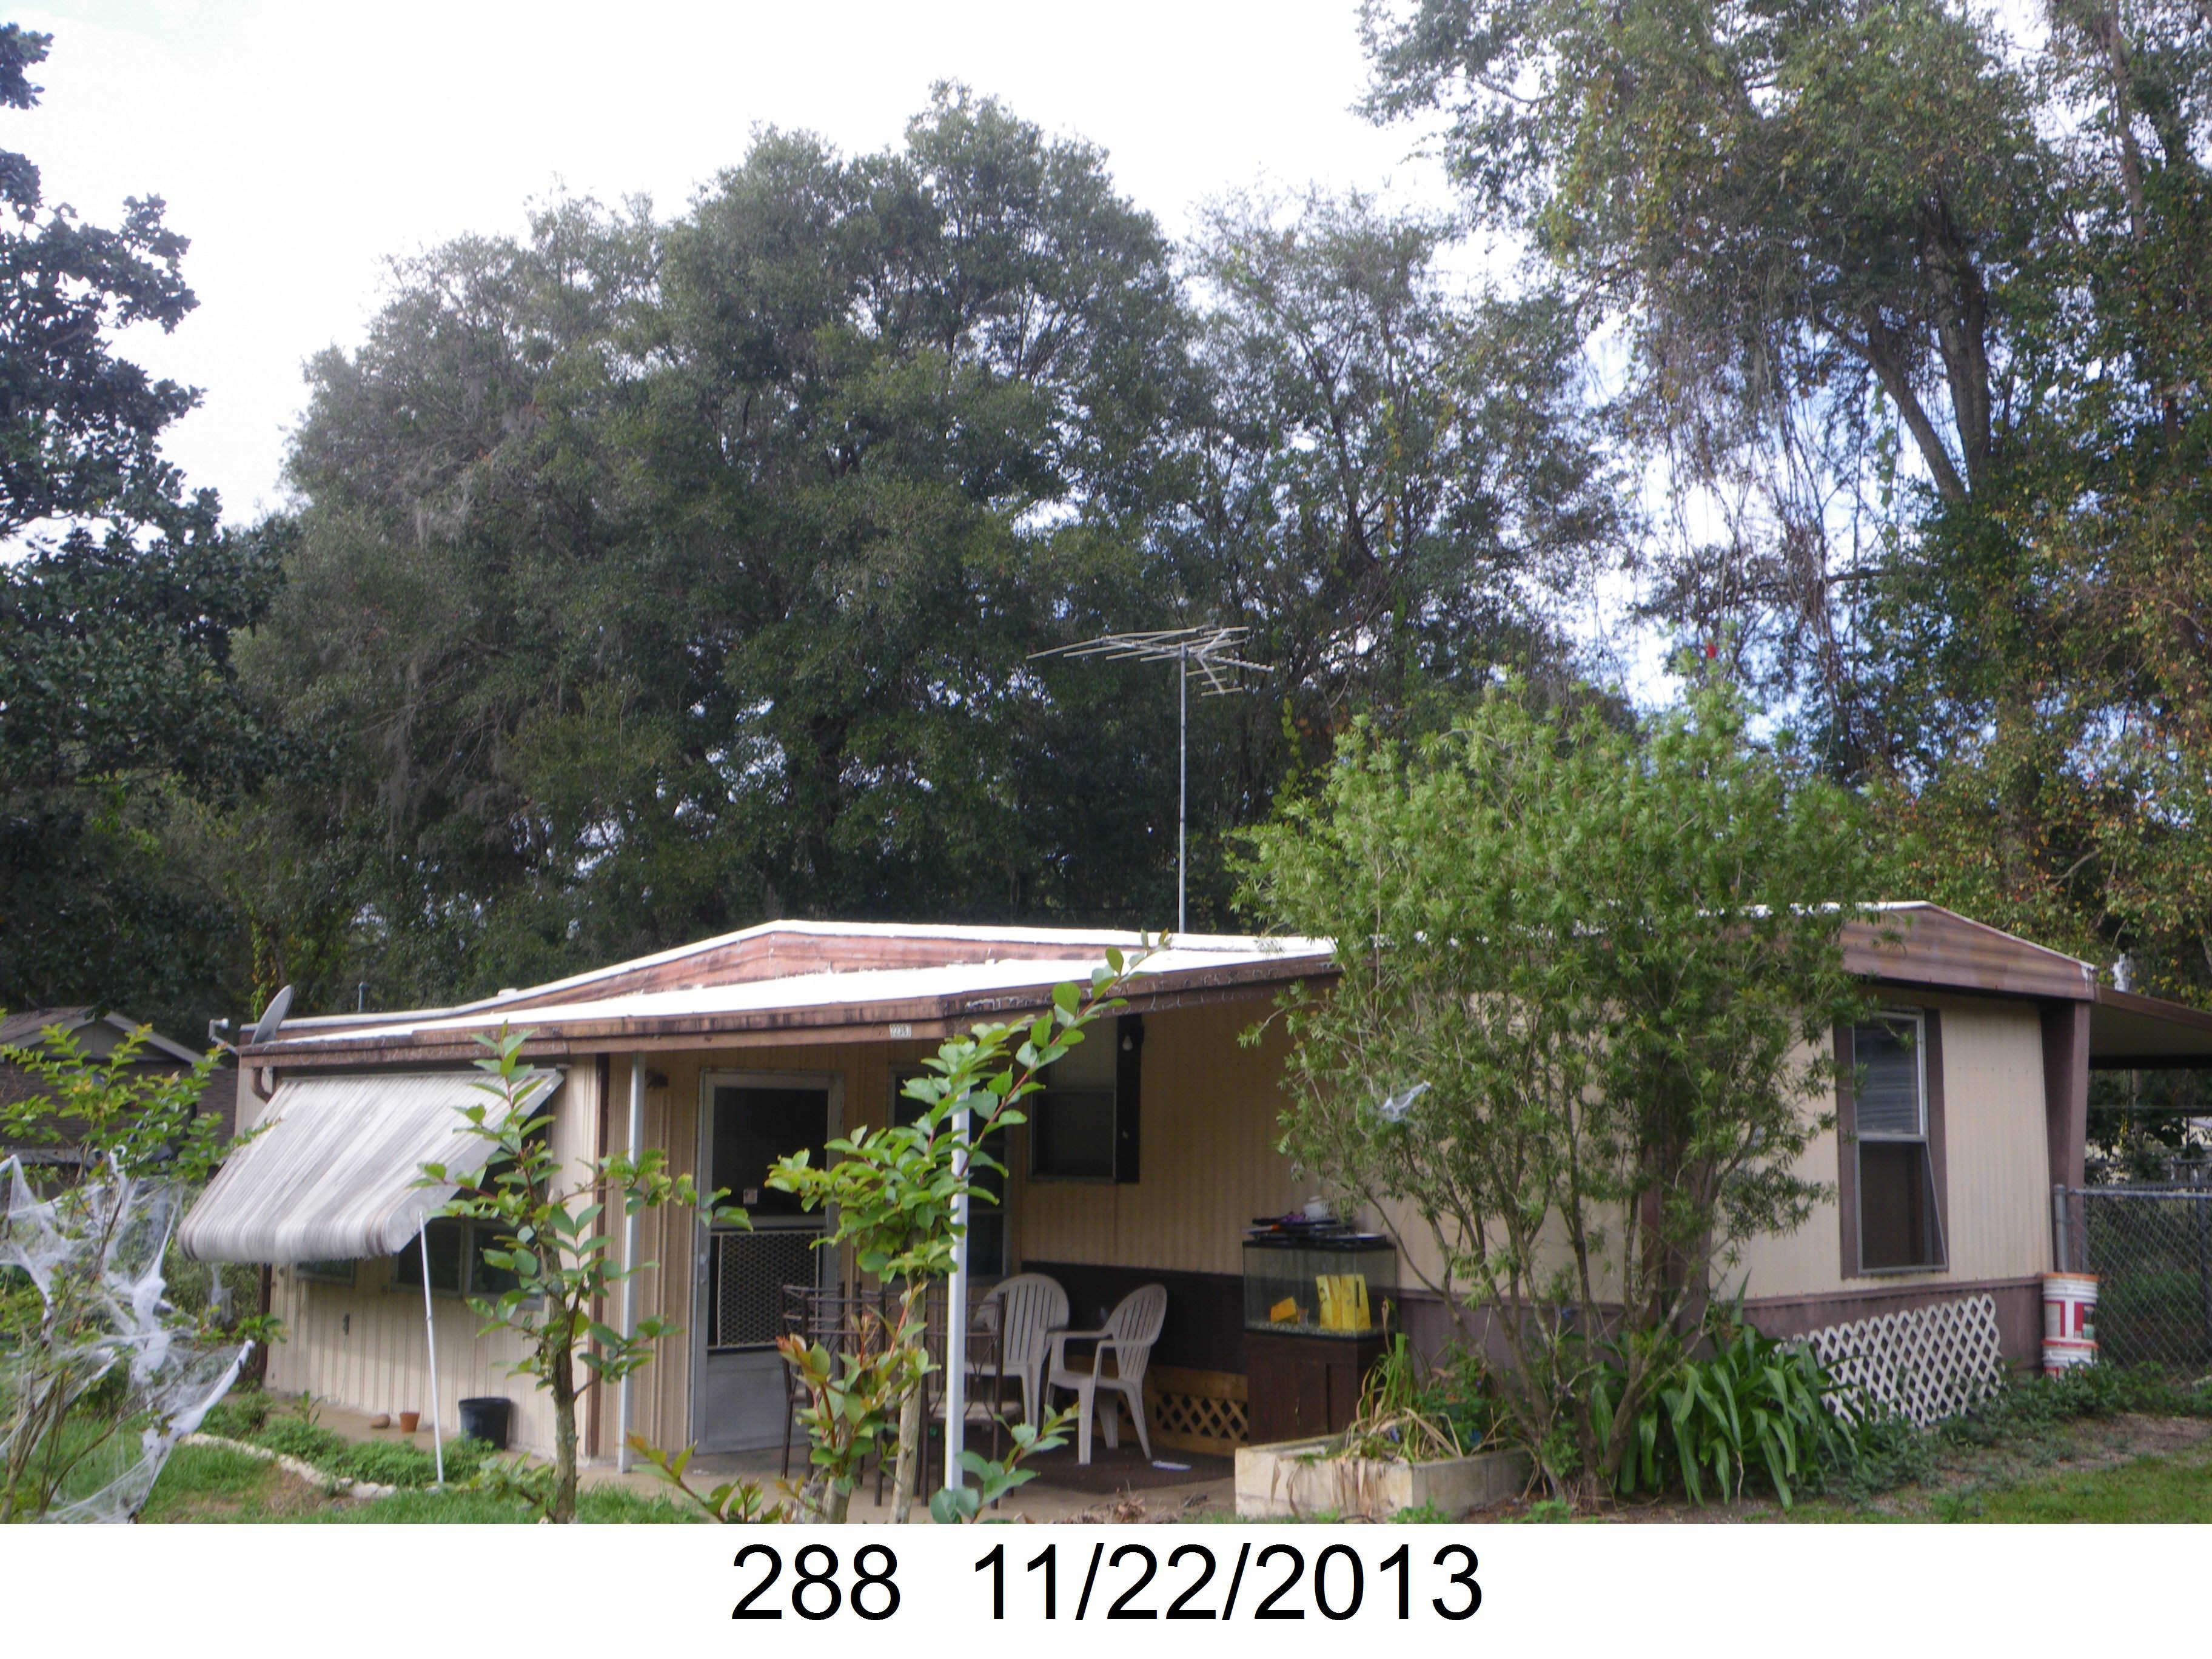 ForSaleByOwner (FSBO) home in Brooksville, FL at ForSaleByOwnerBuyersGuide.com